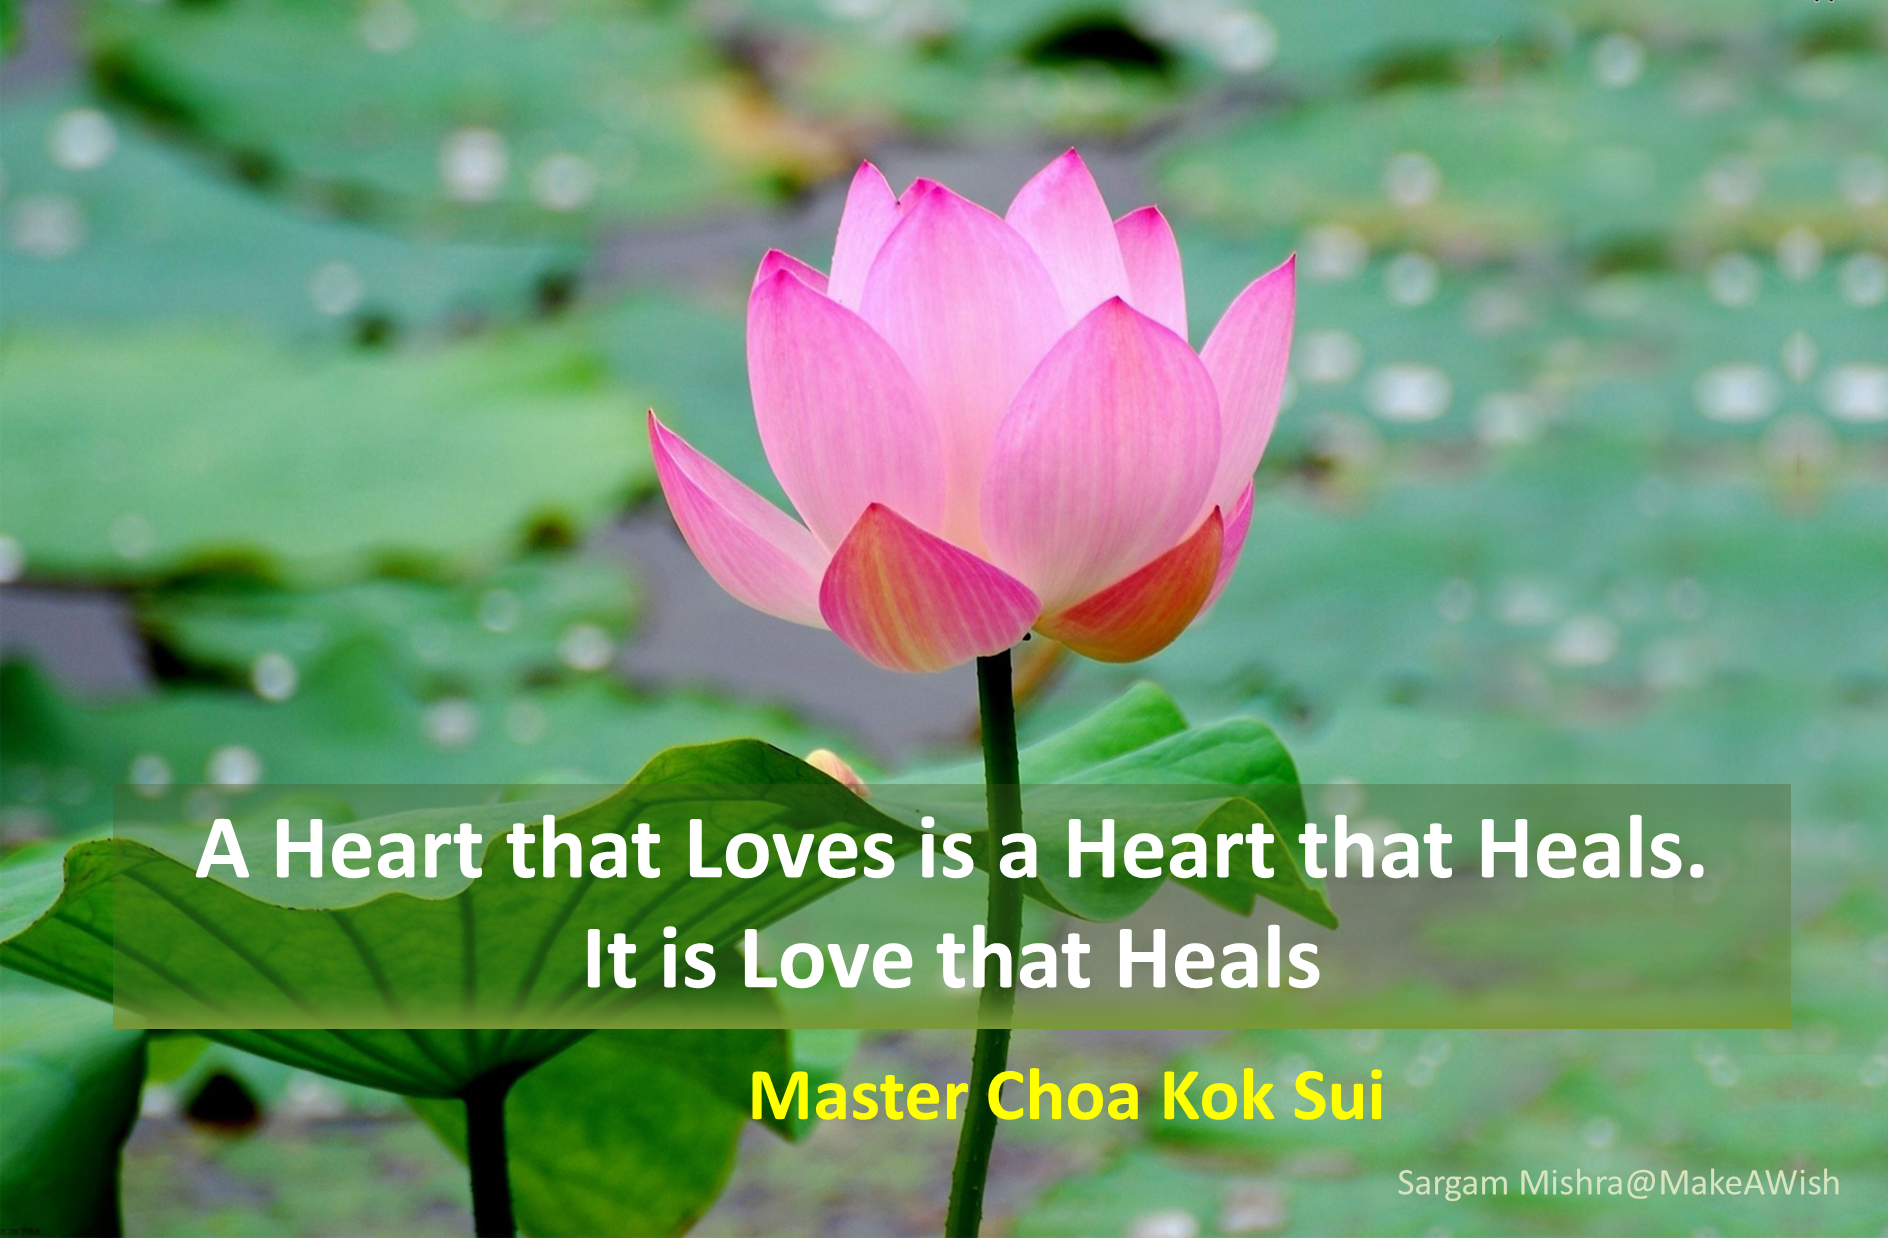 Love Heals The Heart Sargam Mishra